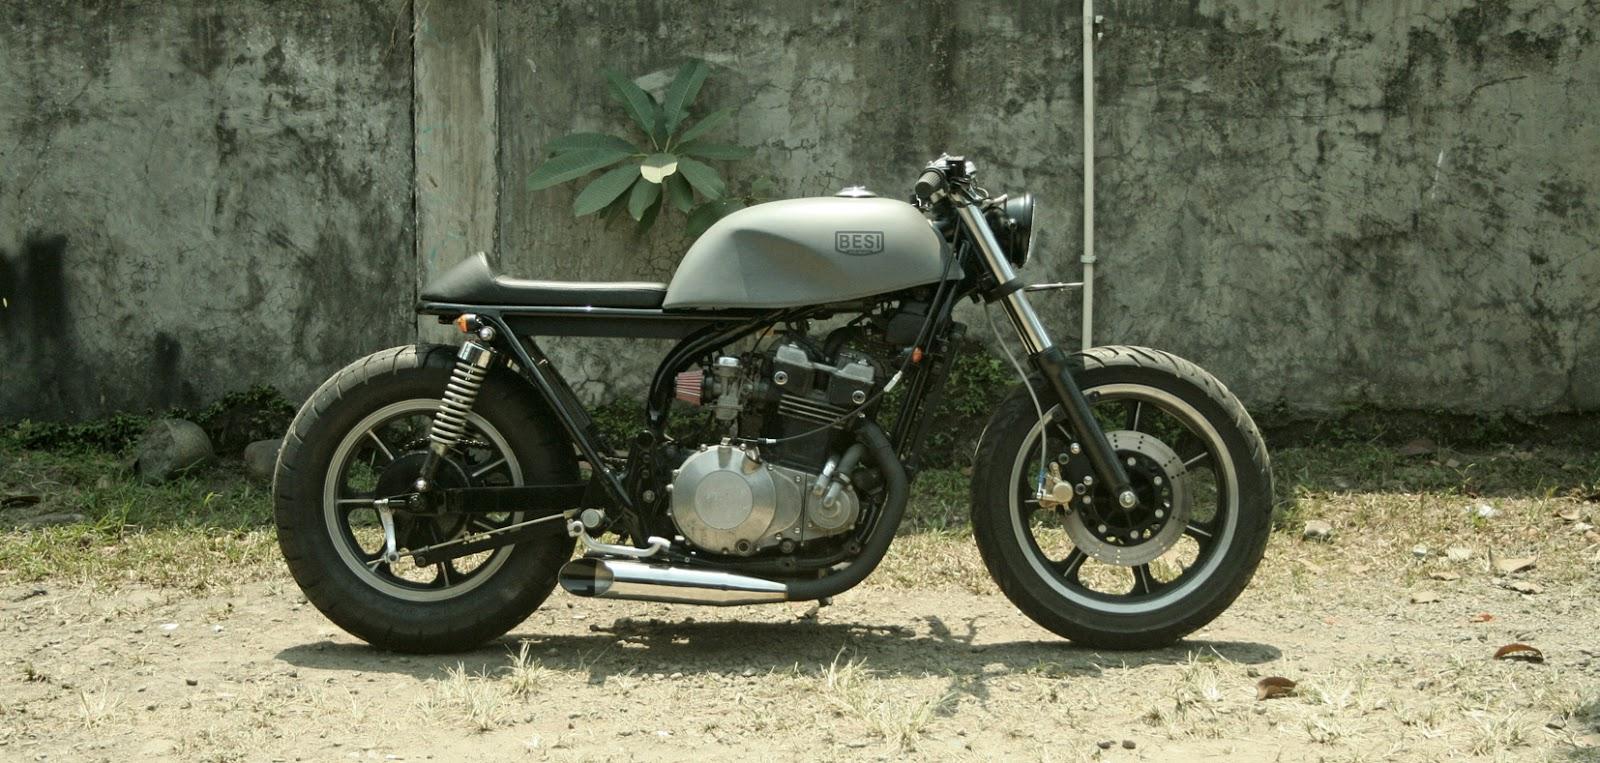 besi moto project